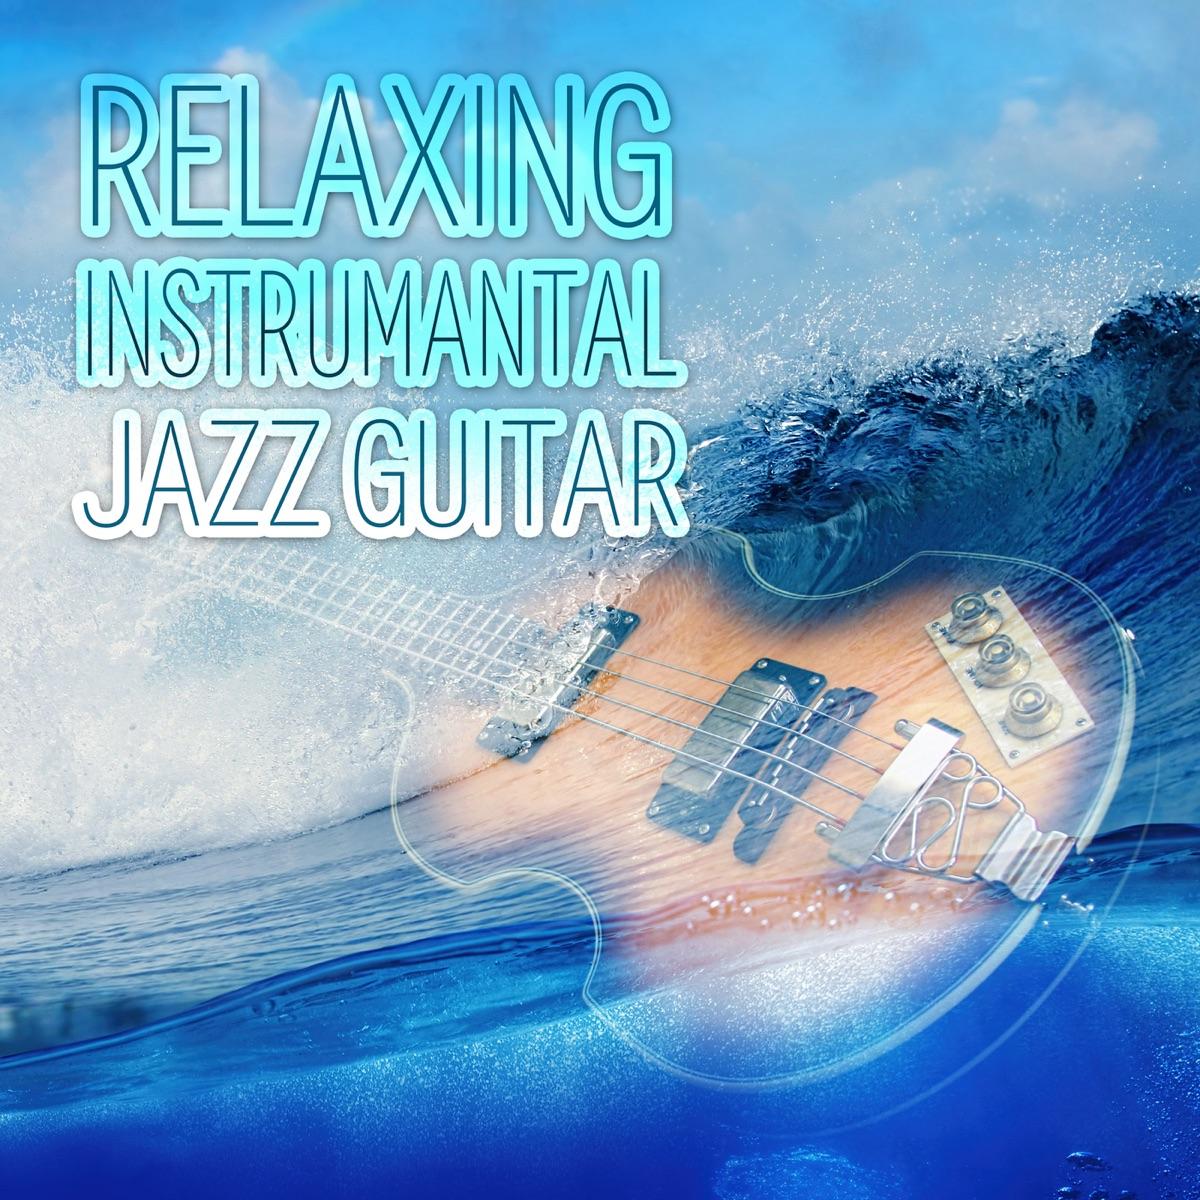 Relaxing Instrumental Jazz Guitar - Chill Music, Romantic Dinner